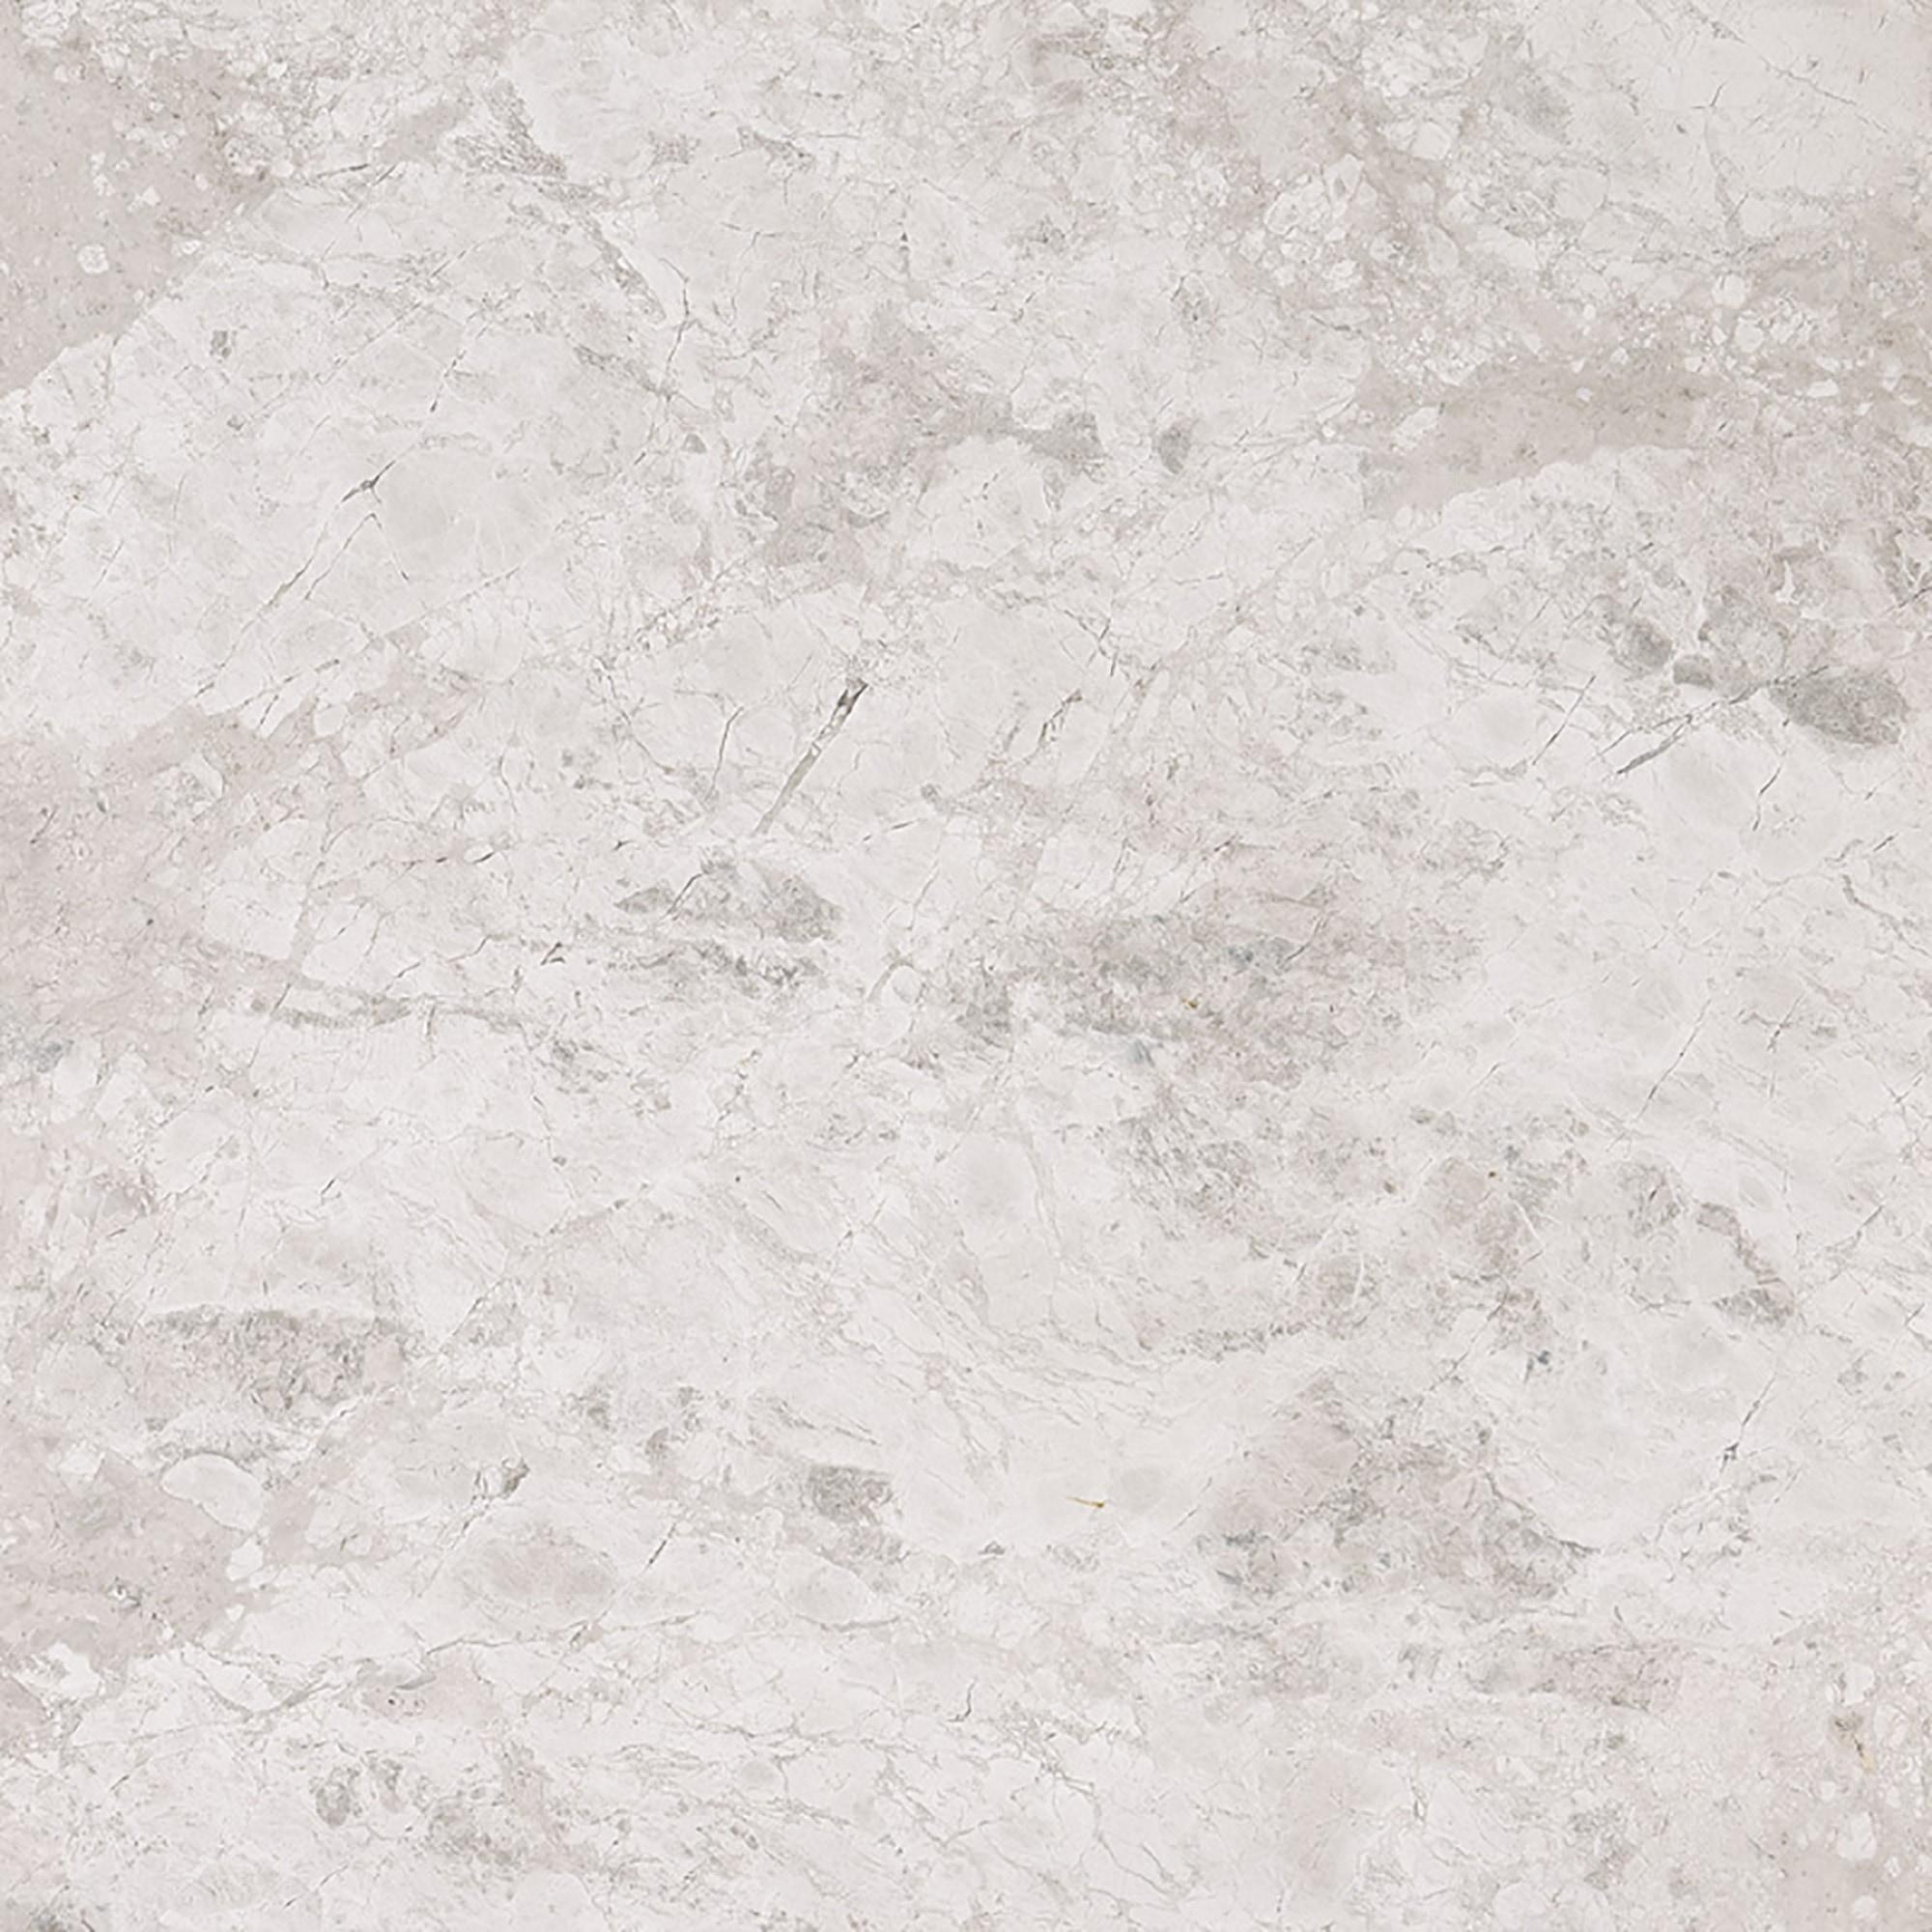 Afyon White Marble Price